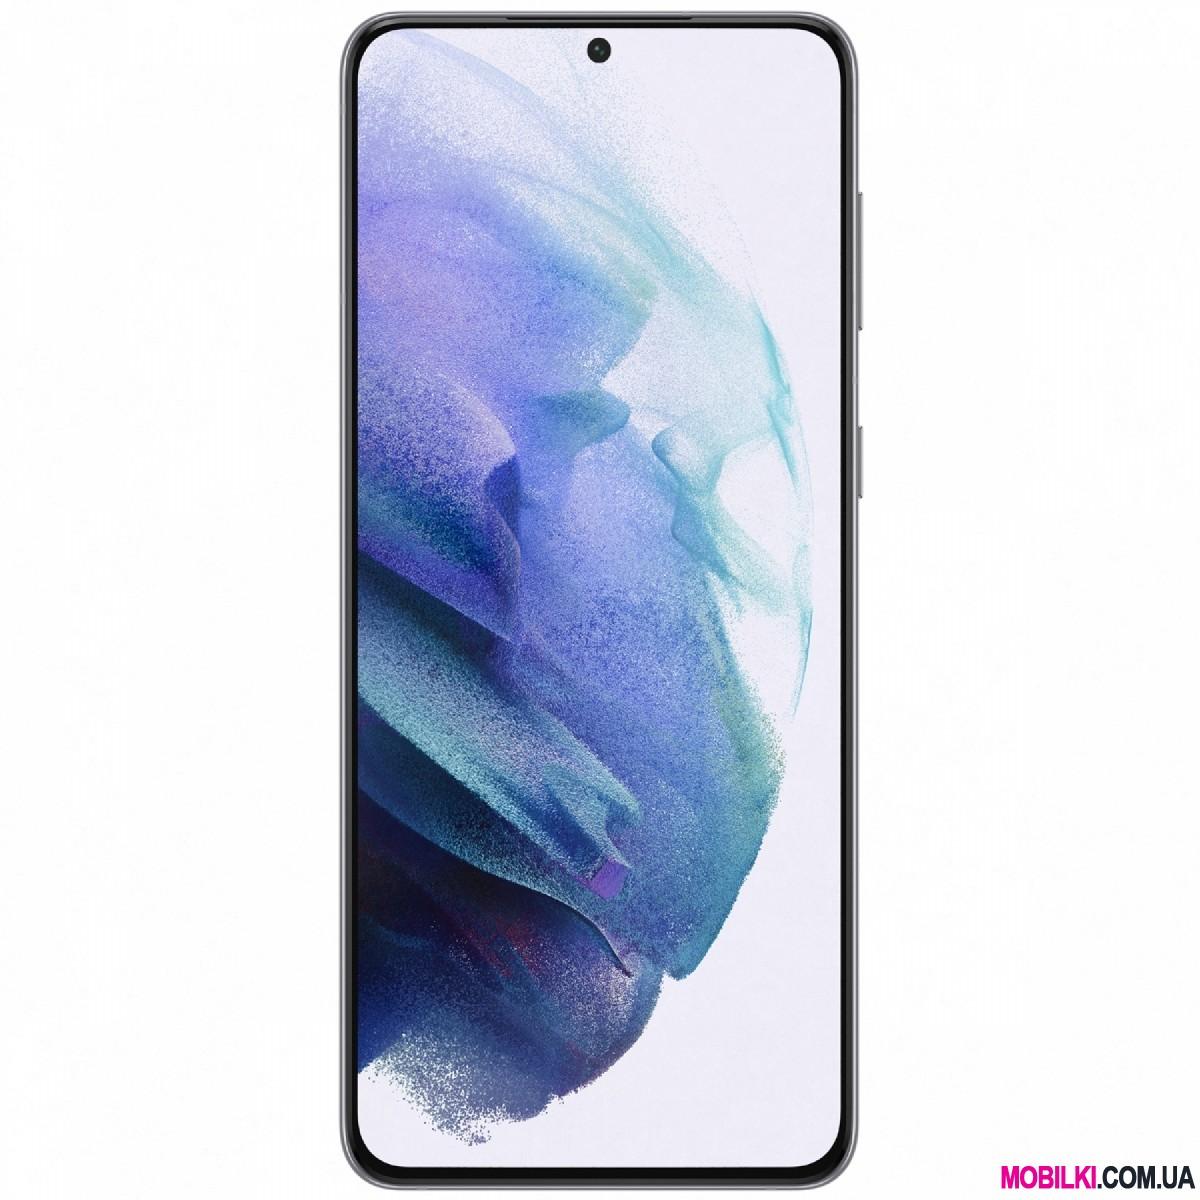 Samsung Galaxy S21 Plus 8/256Gb